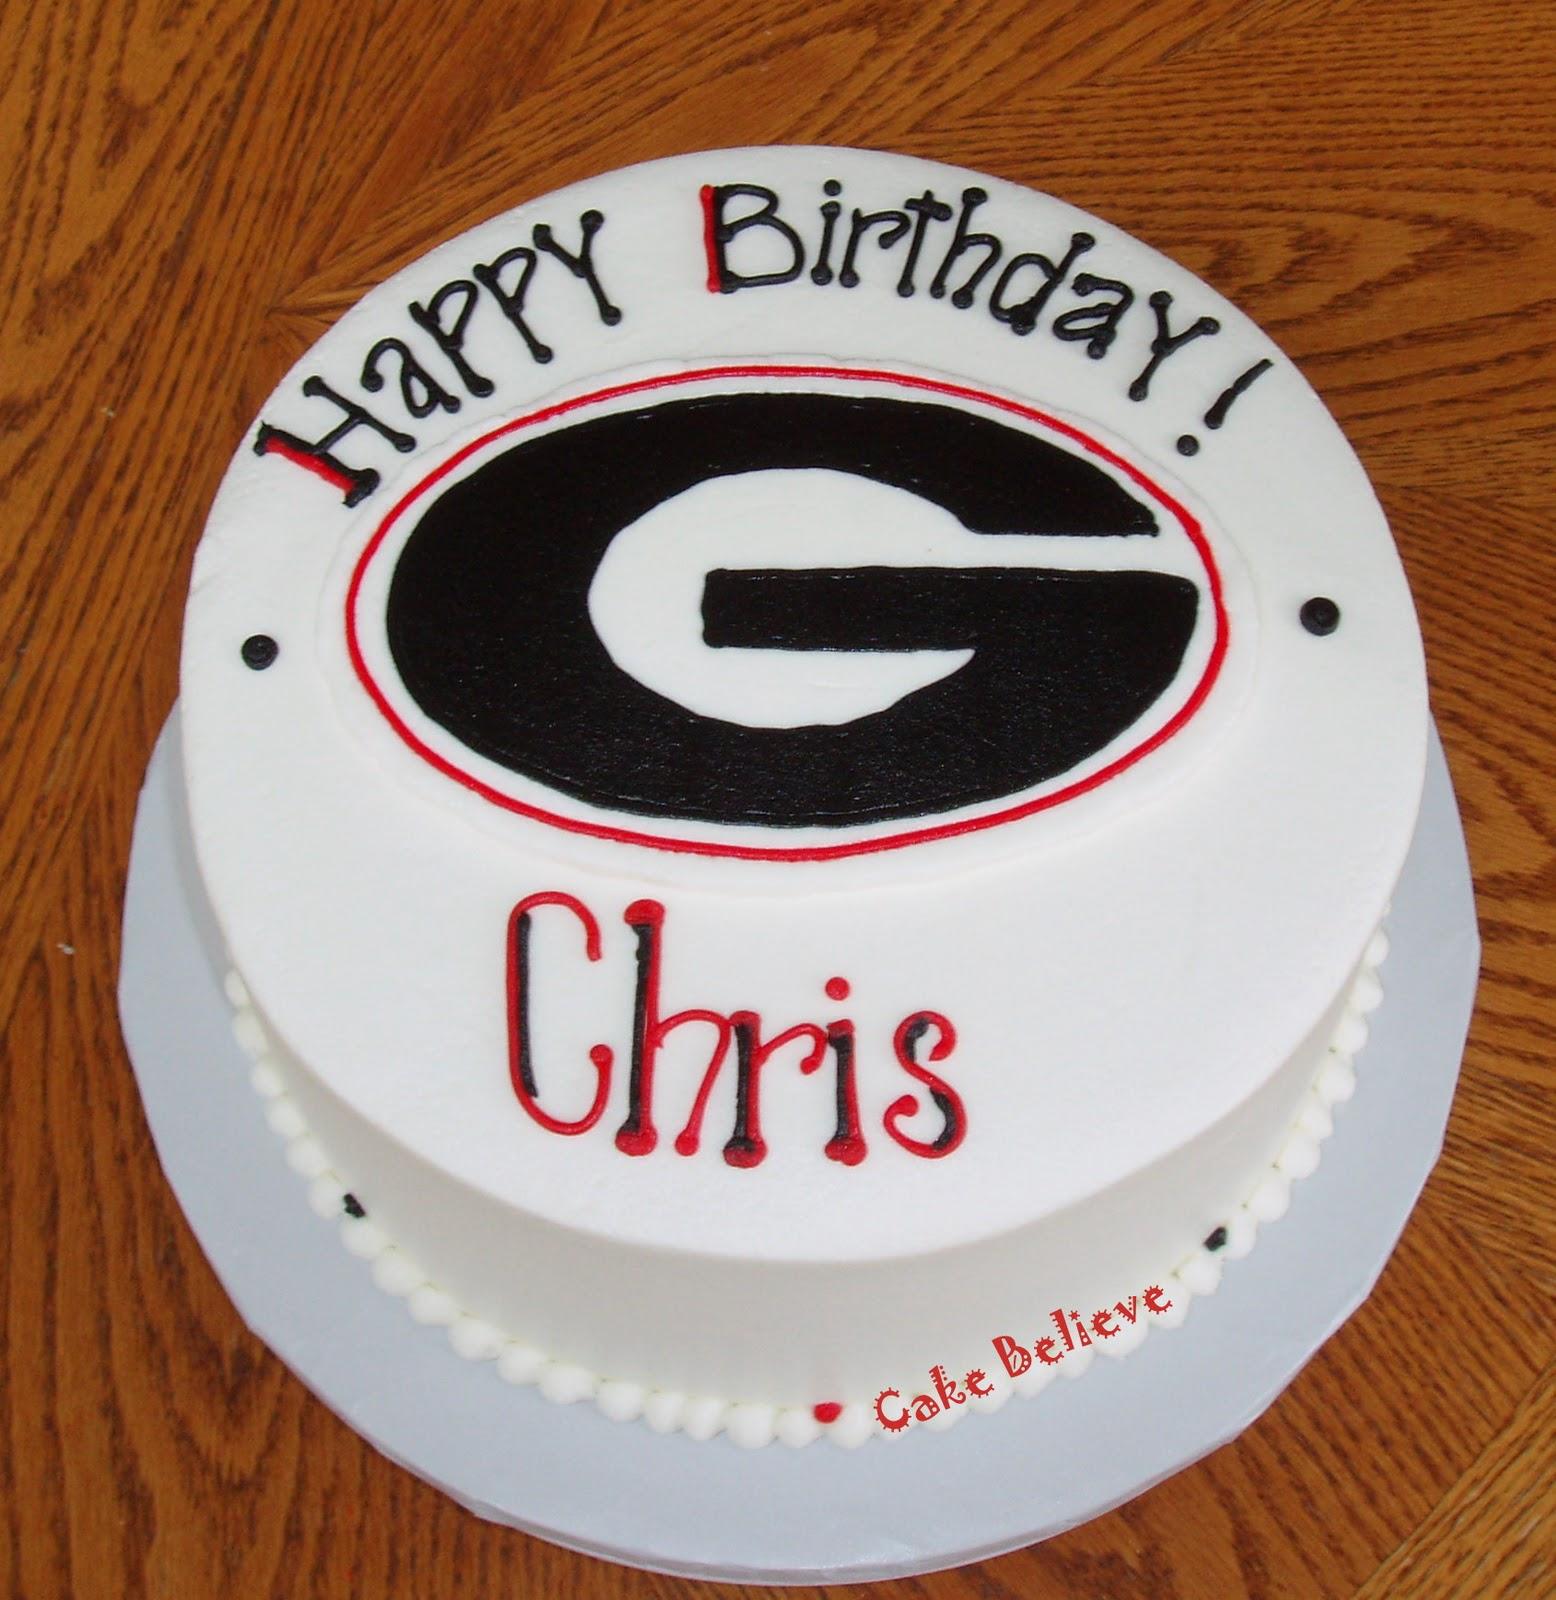 Cake Believe: University Of Georgia Birthday